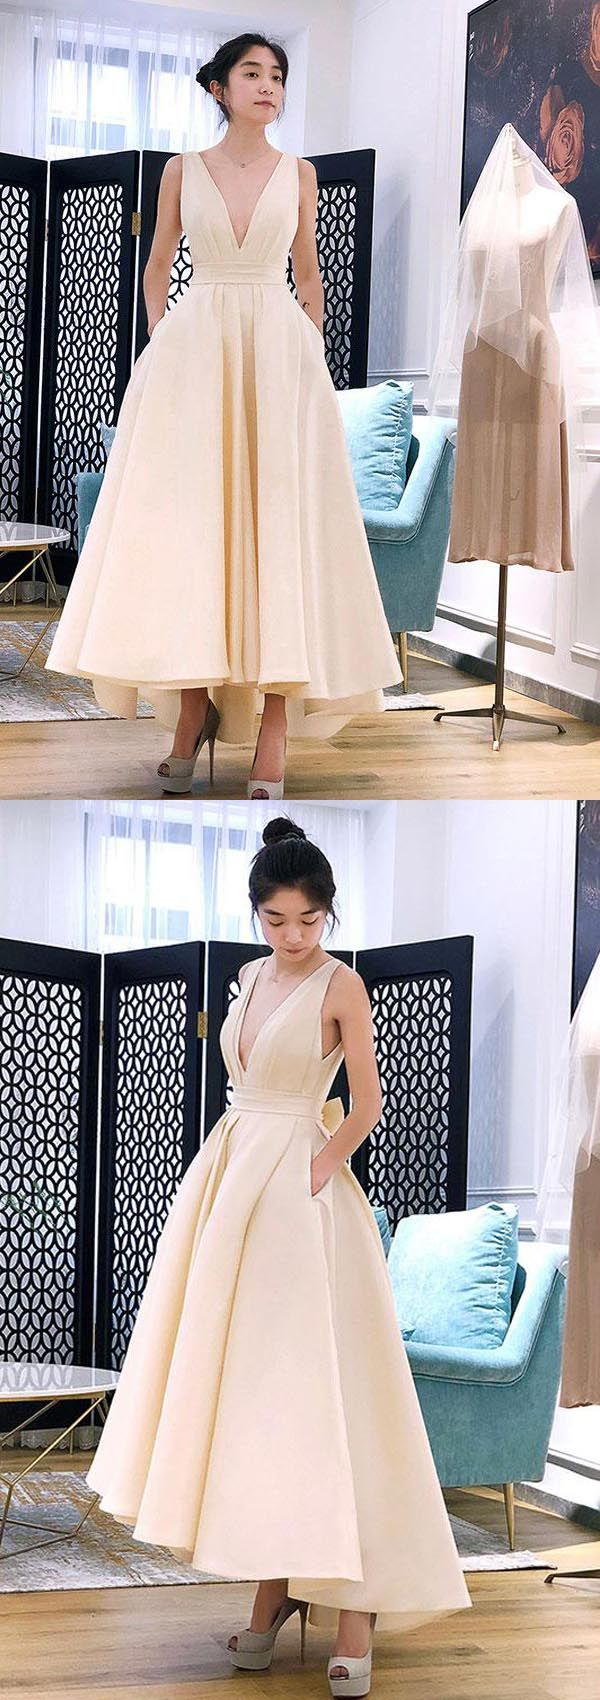 Aline high low v neck short prom dress homecoming dress pg